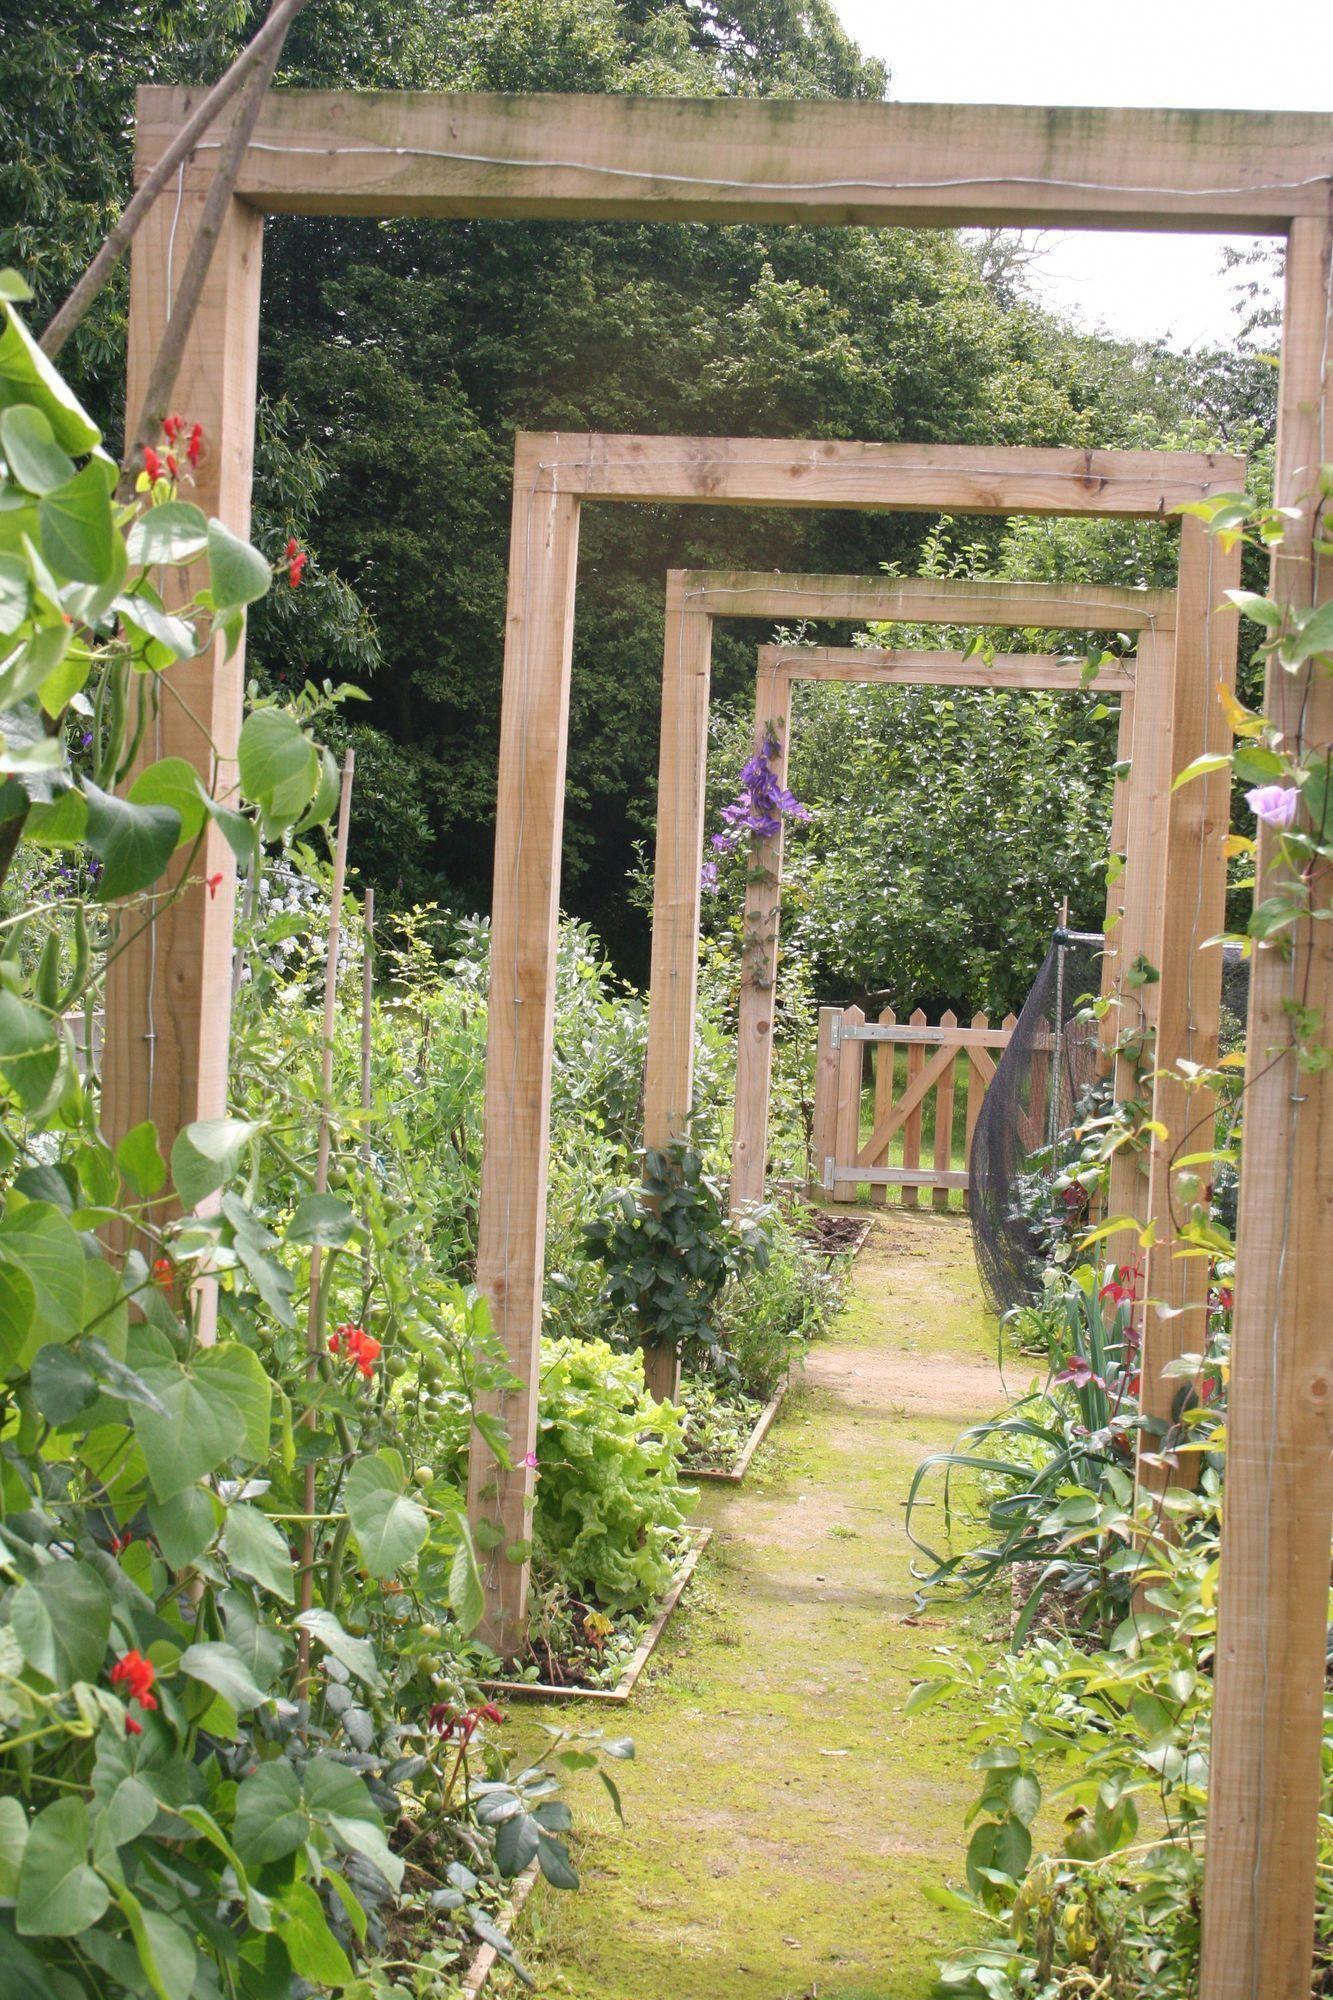 Diy Vegetable Garden For Beginners Raised Beds How To Build